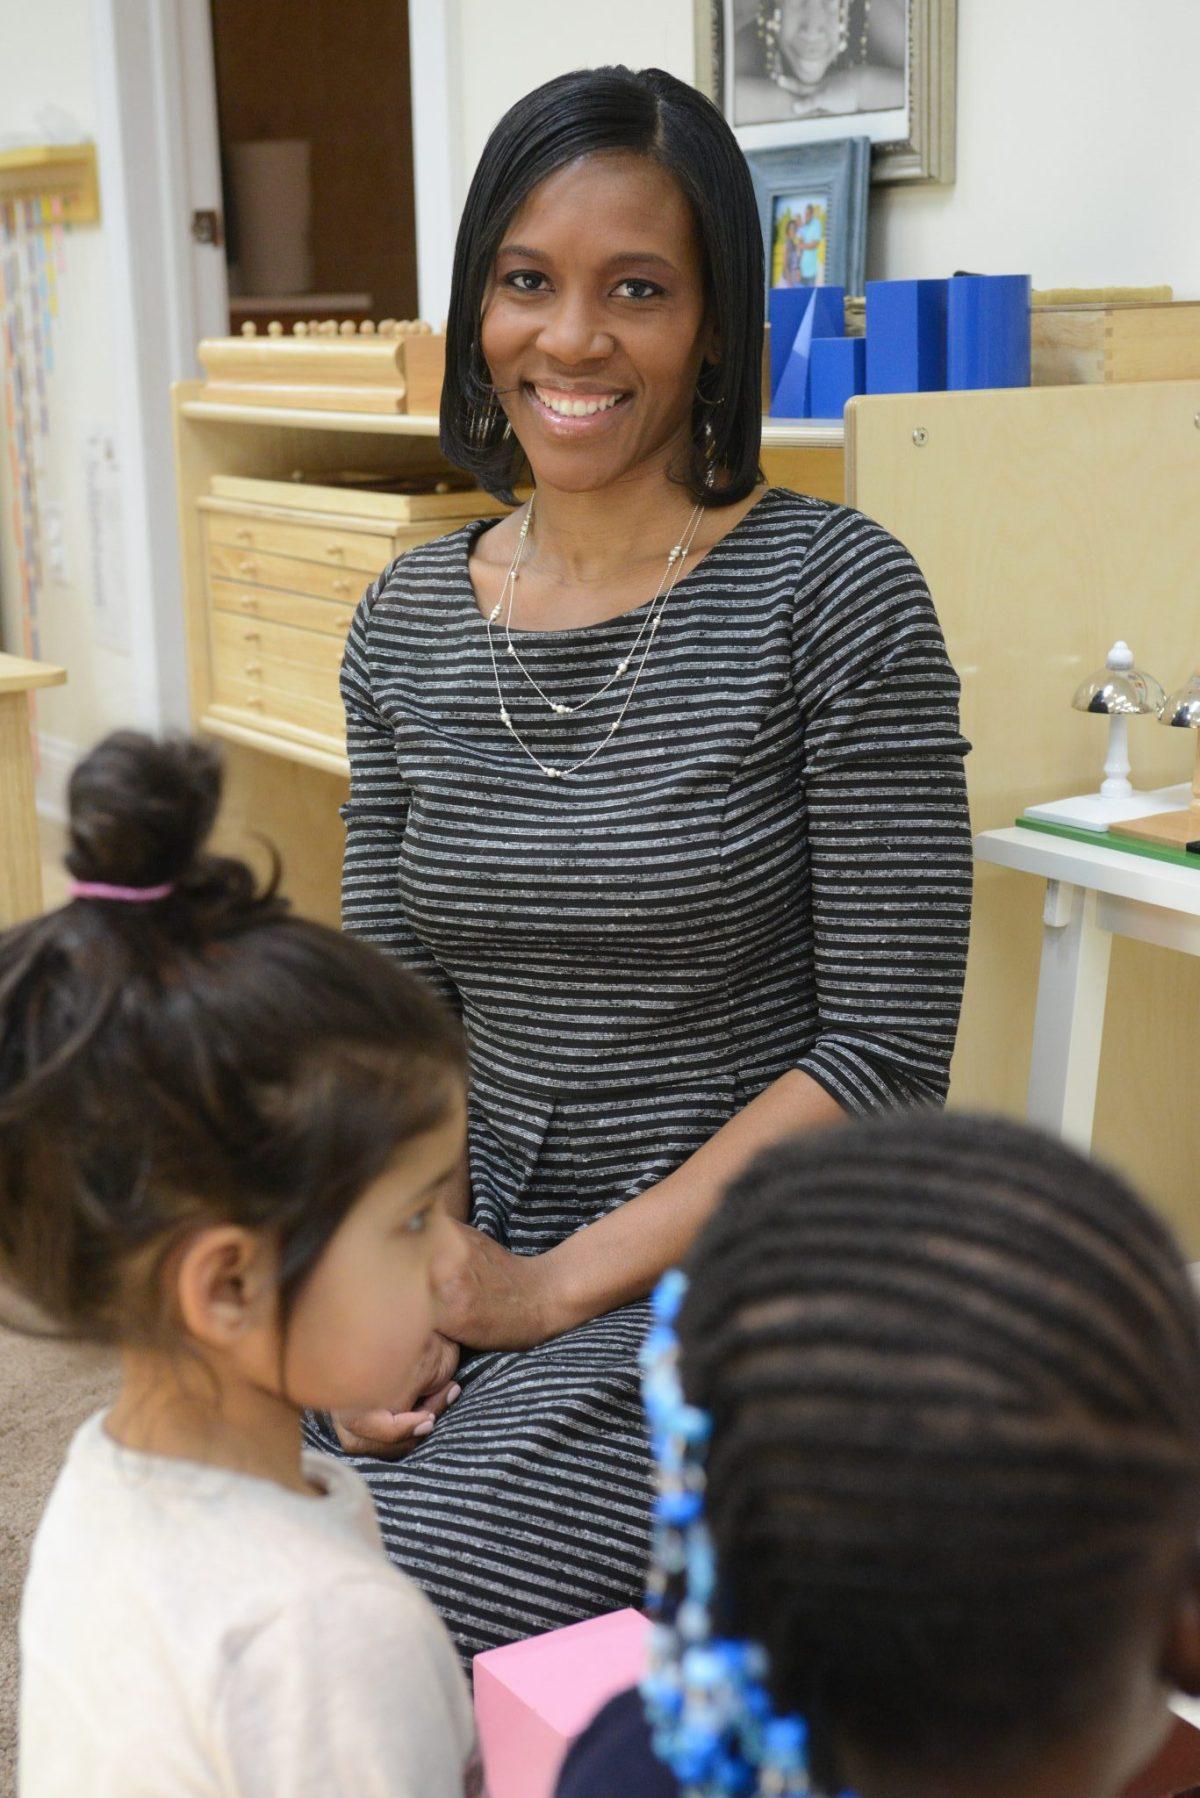 Bergen-Lafayette Montessori School